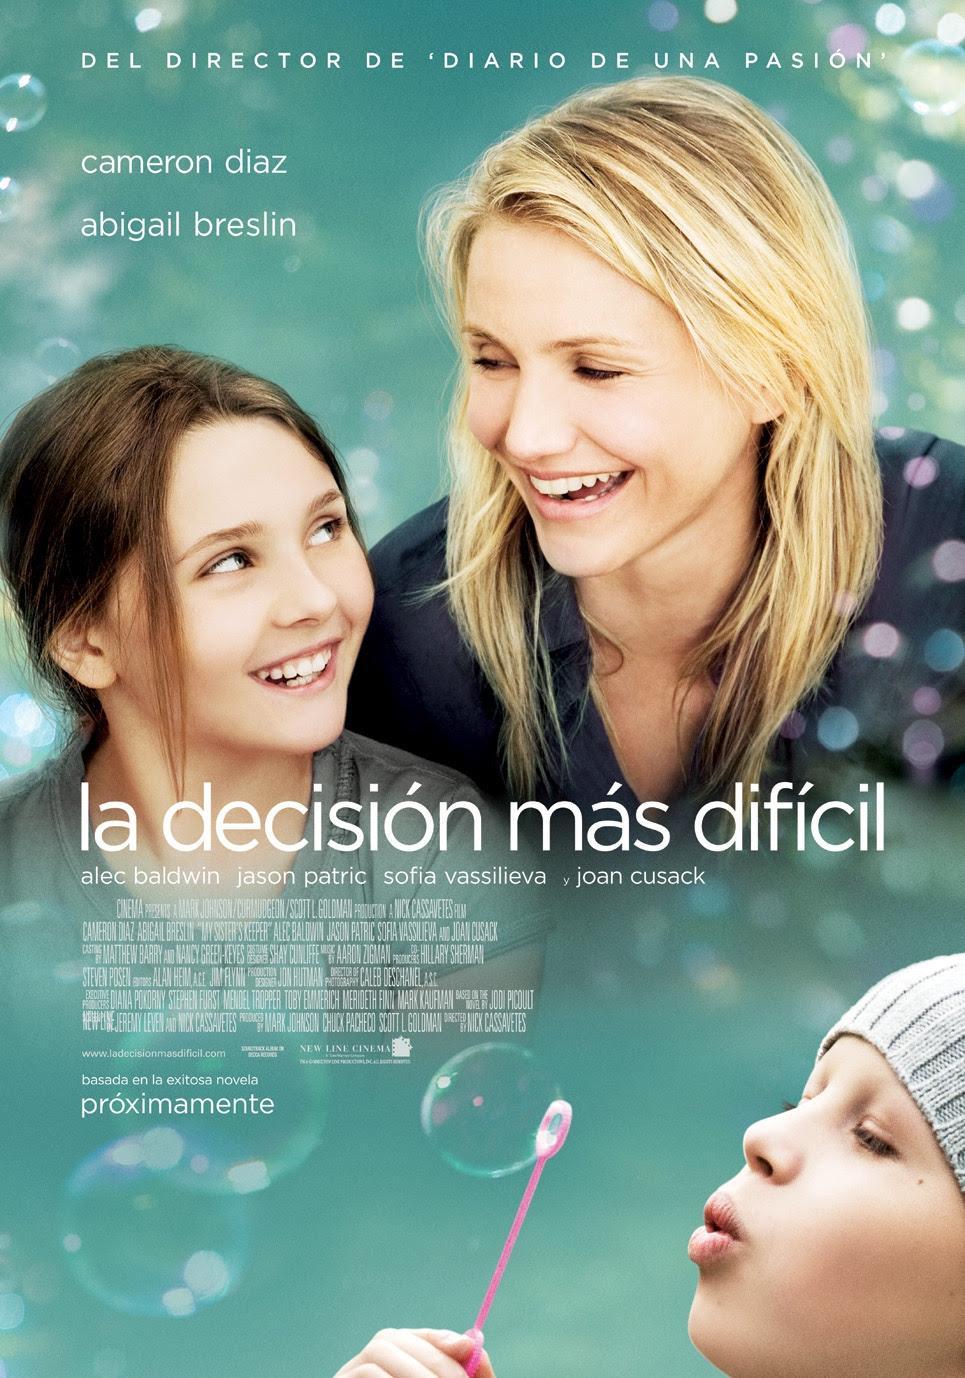 http://tvnotiblog.com/wp-content/uploads/2009/05/poster-la-decision-mas-dificil.jpg